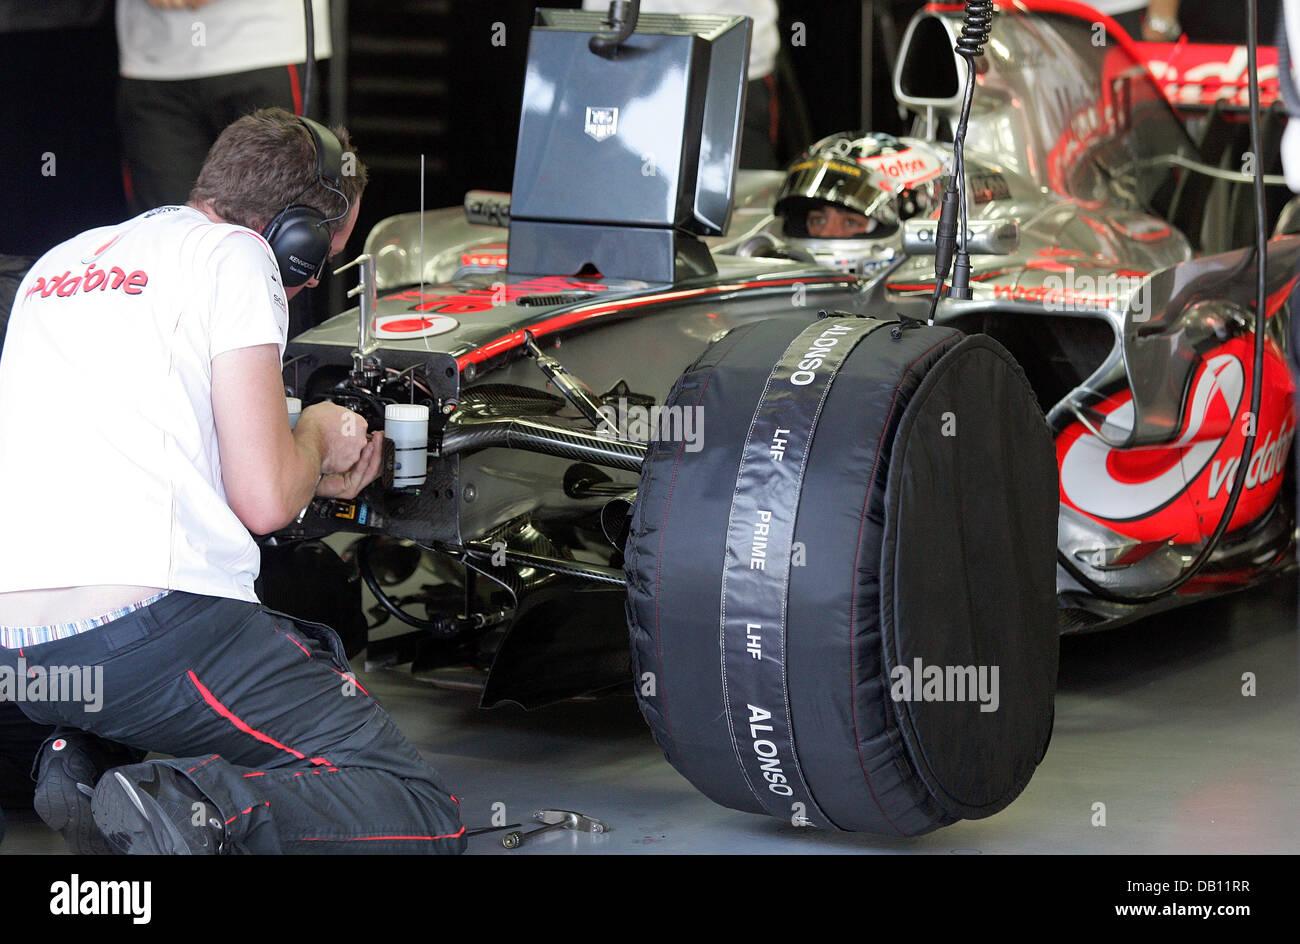 7f126db6735 A mechanic of McLaren Mercedes works on the race car of Spanish Formula One  driver Fernando